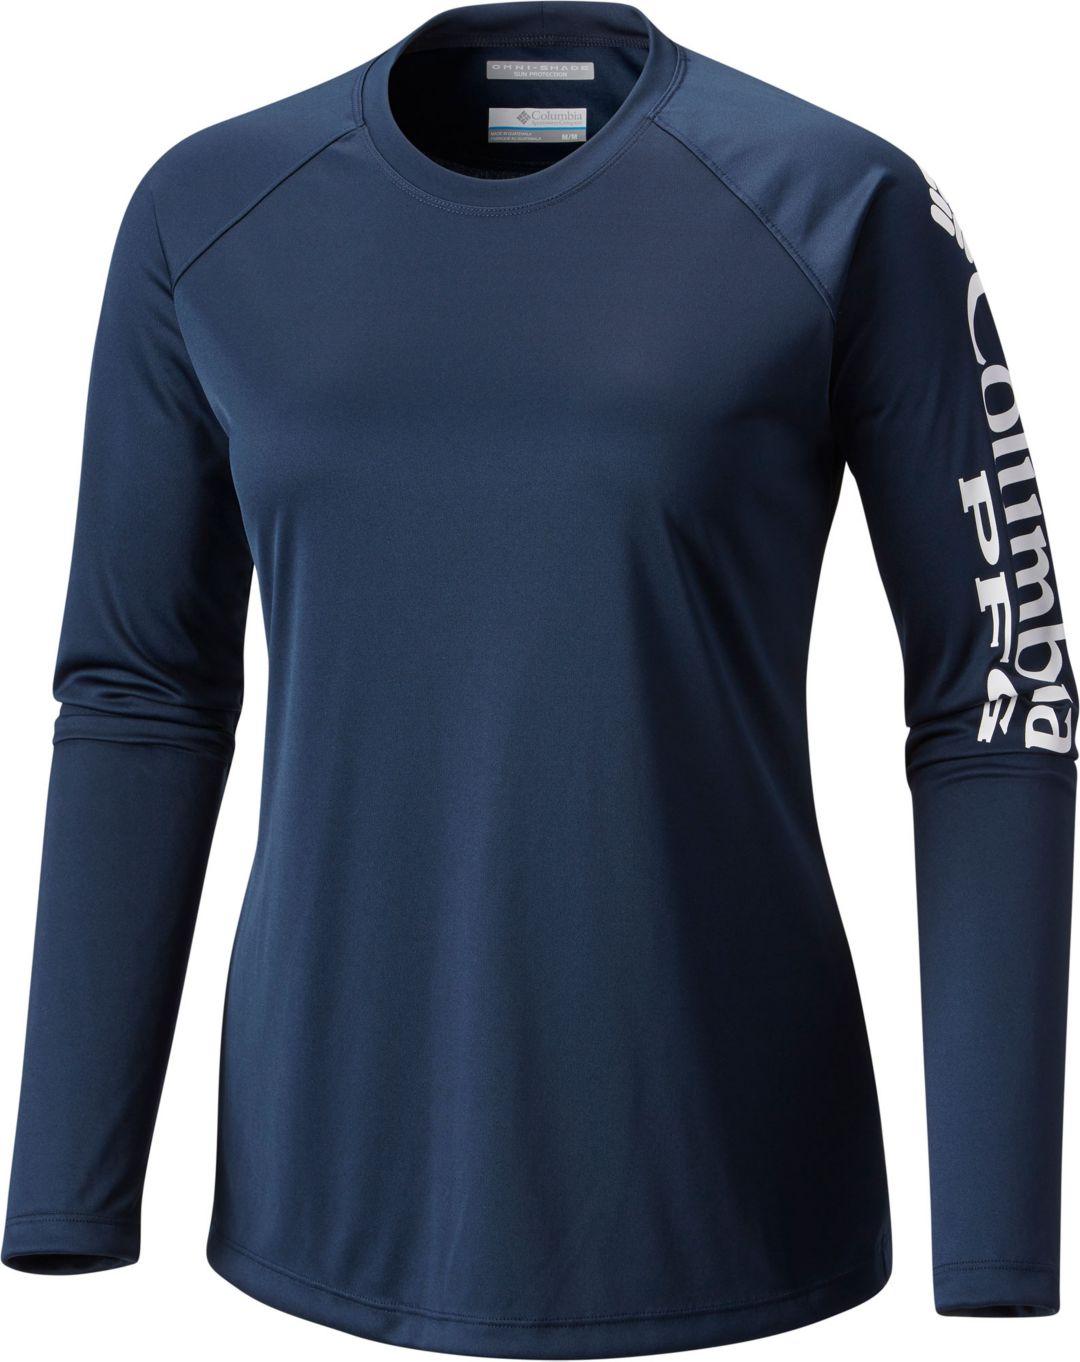 d667c0bd388 Columbia Women's PFG Tidal Tee II Long Sleeve Shirt | DICK'S ...